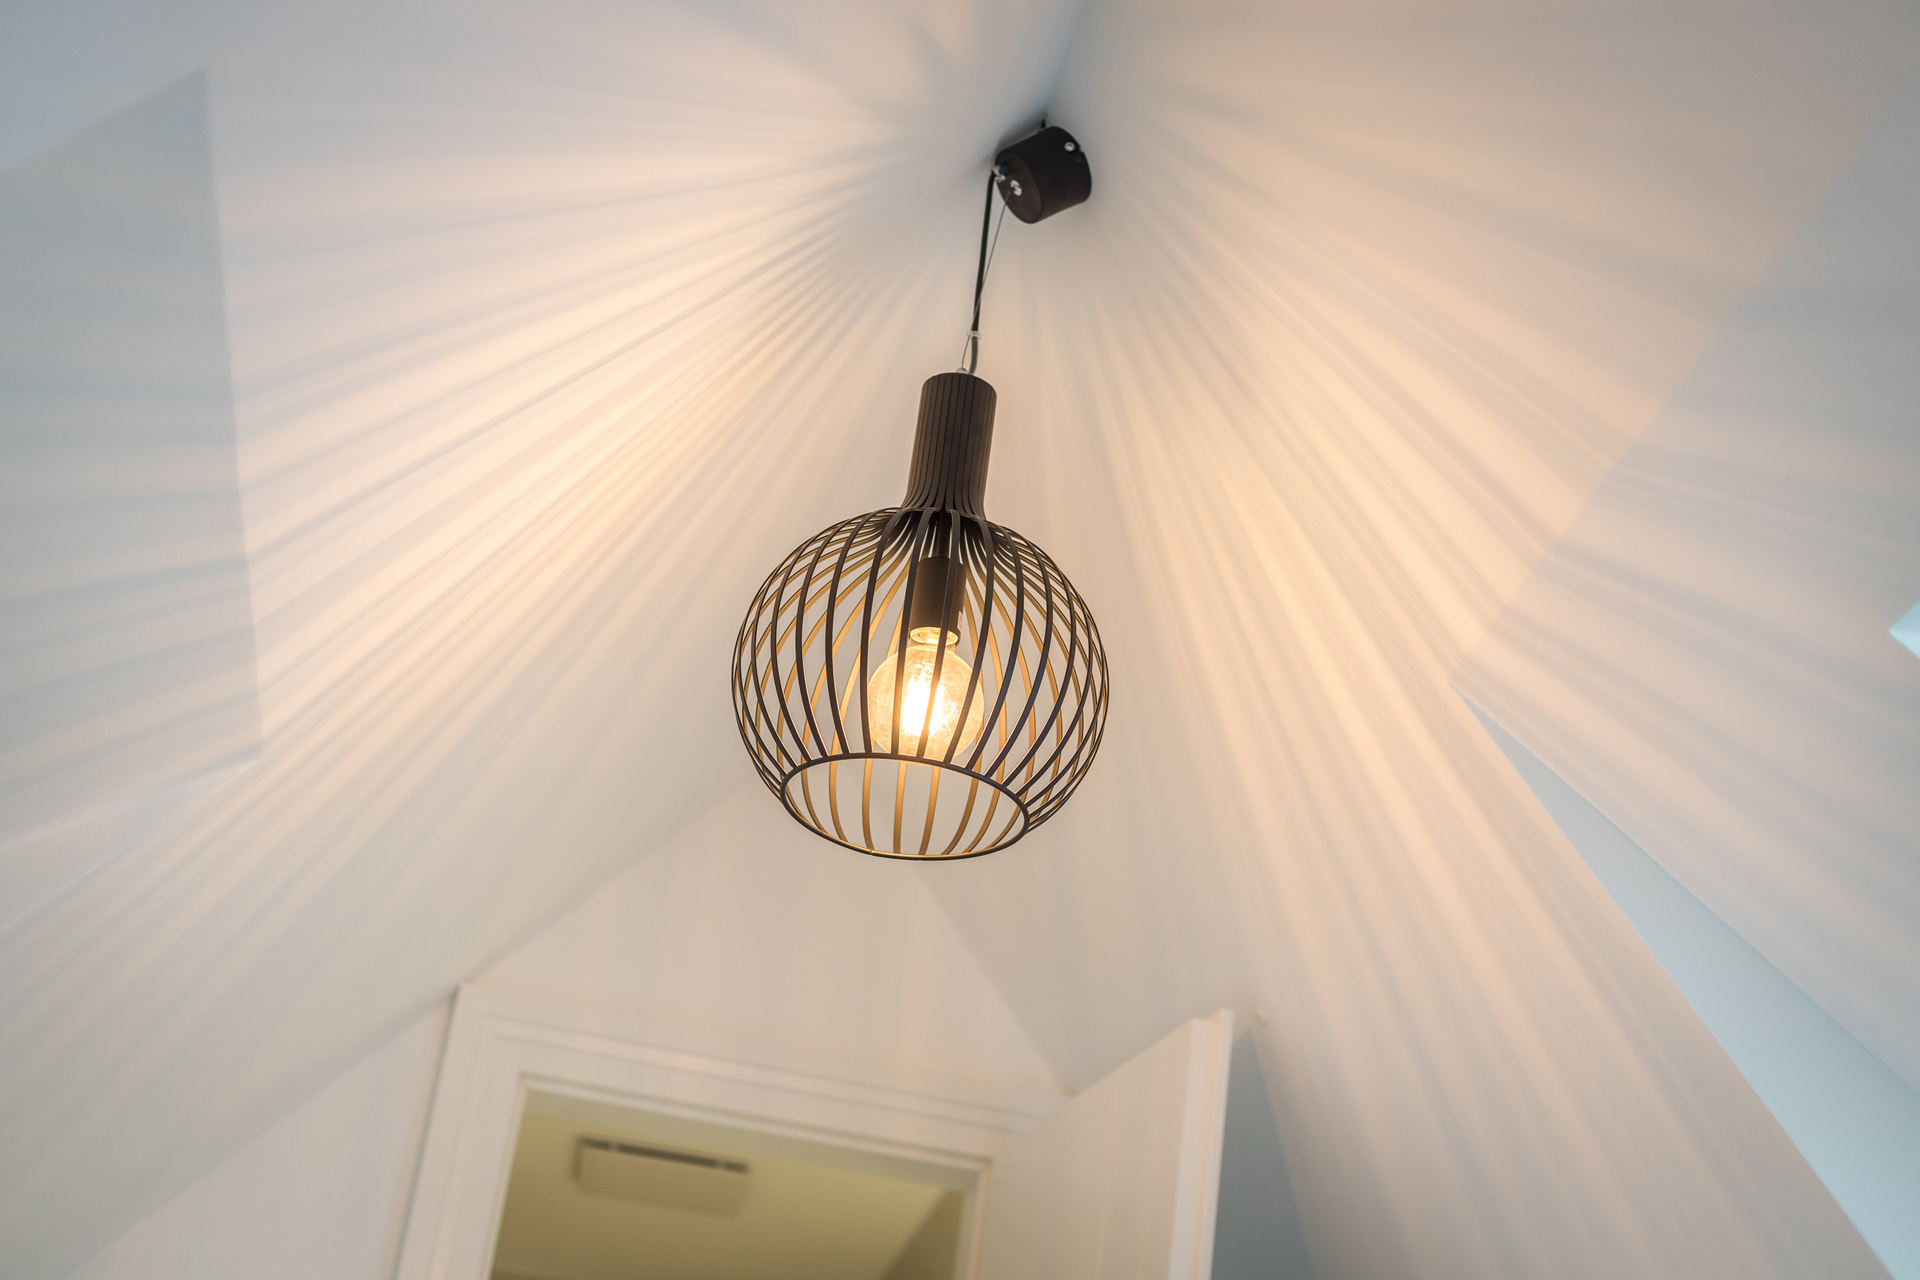 Decken-lampe_2